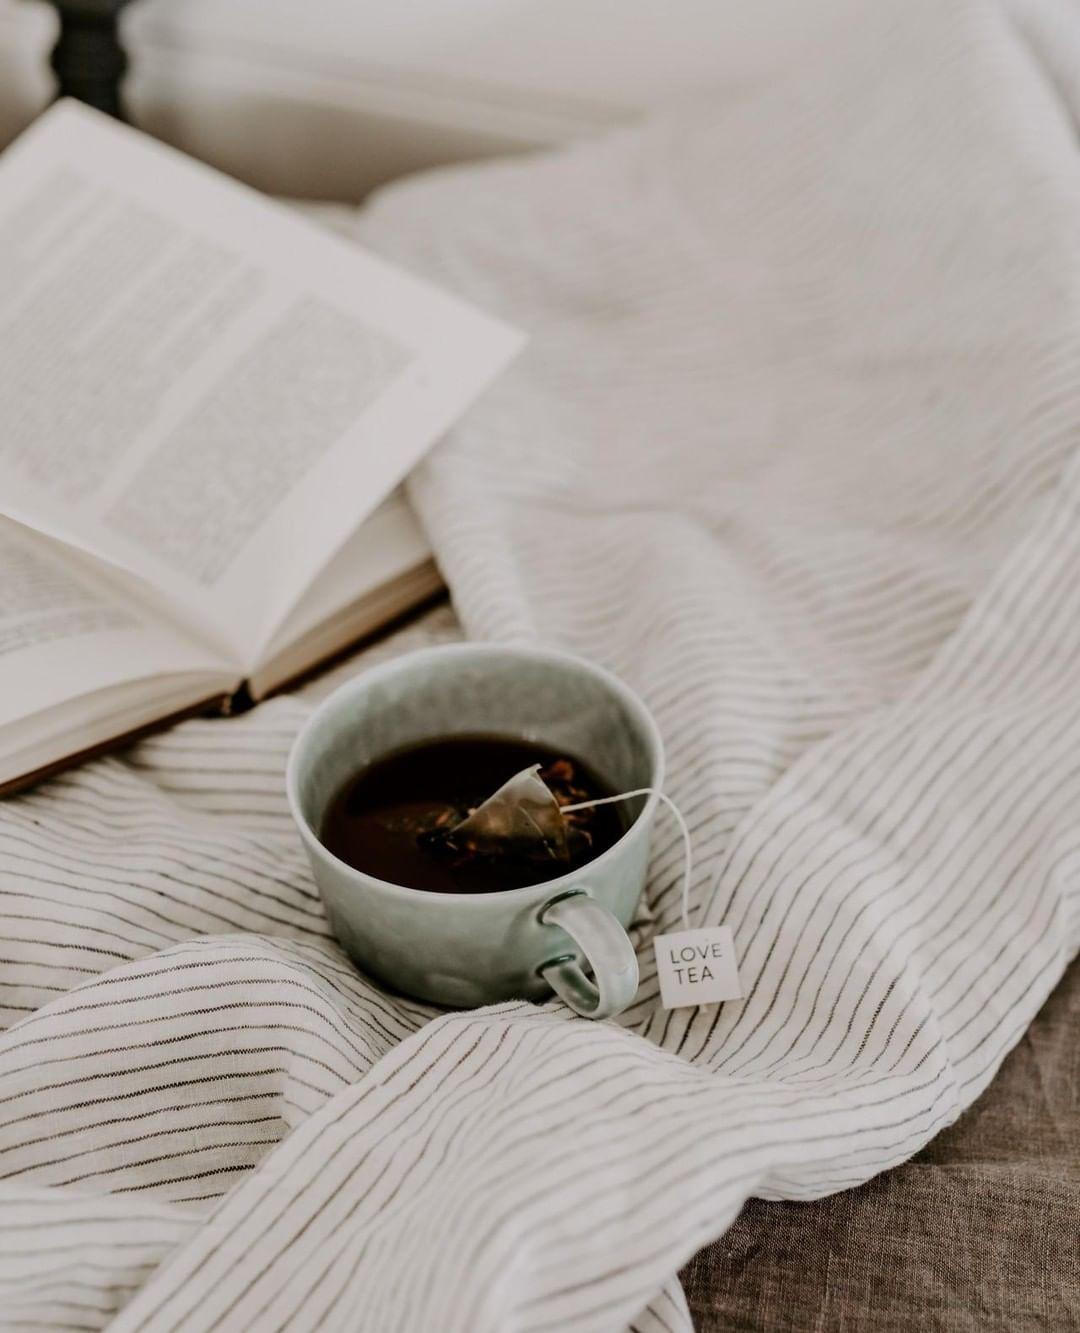 Top 5 Holistic Self-Care Tips